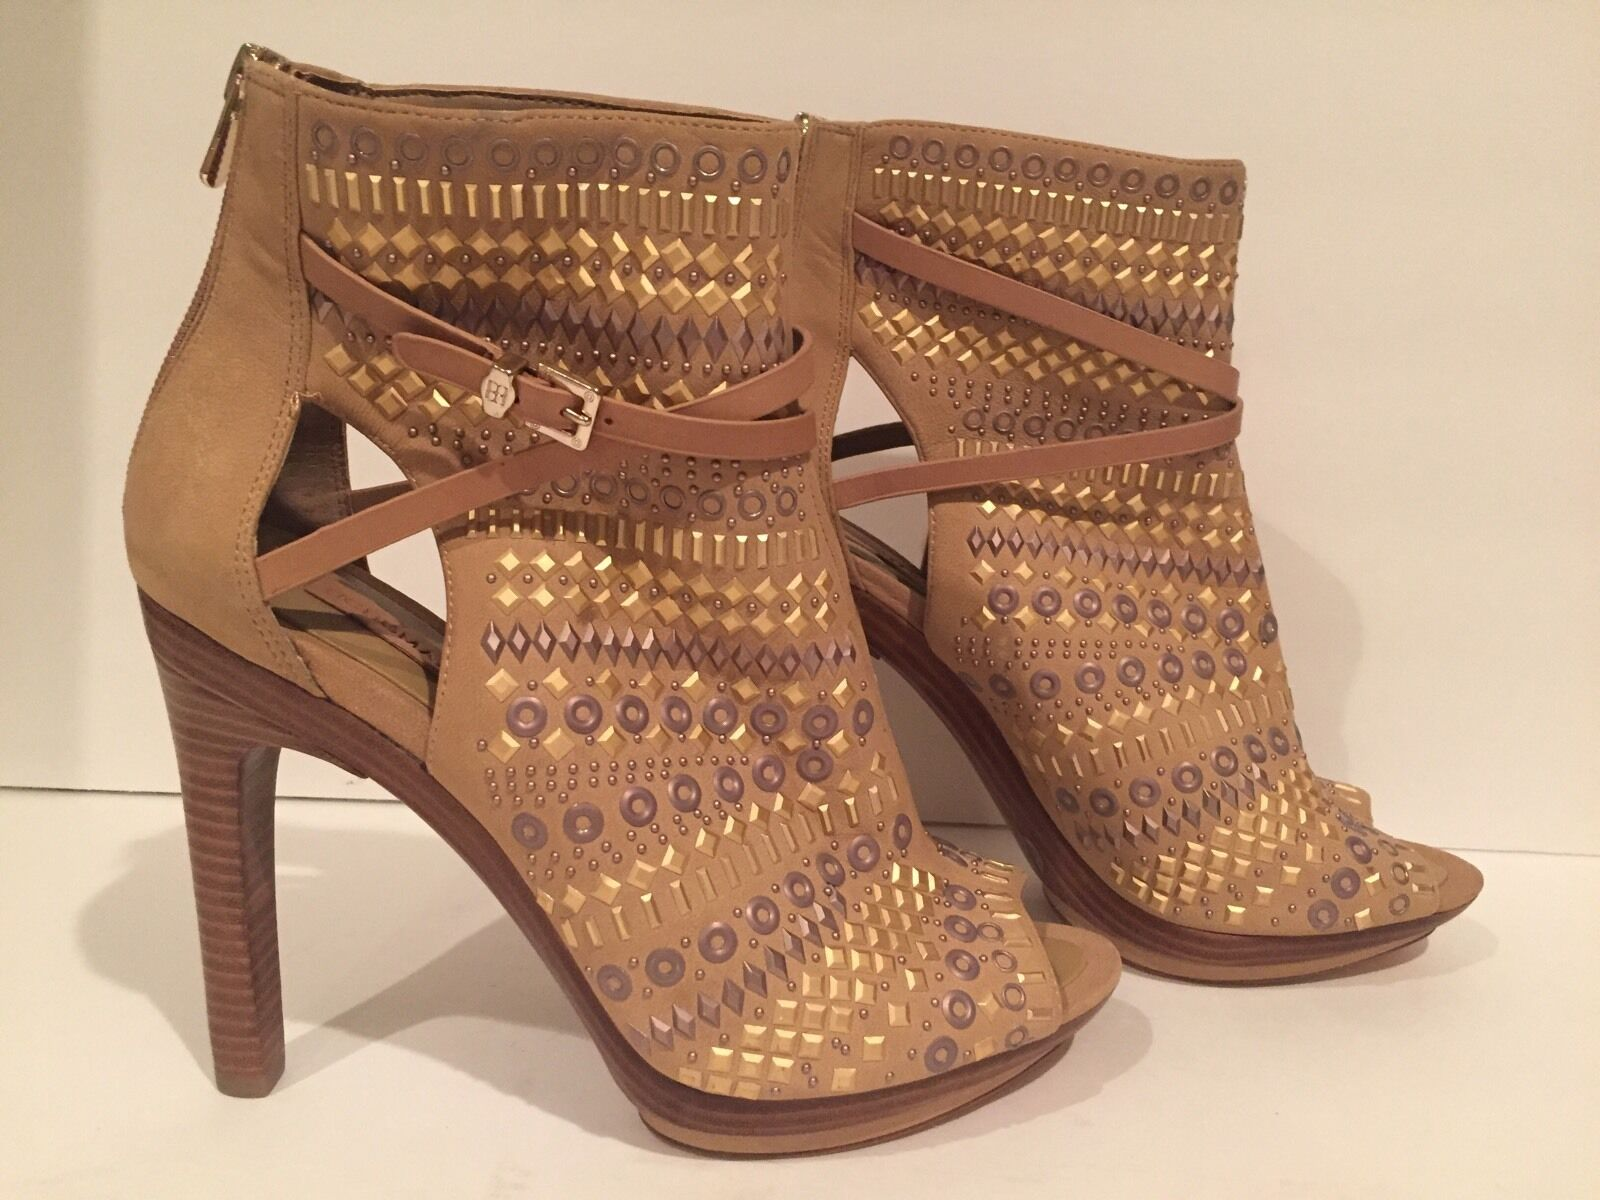 BCBG Max Azria West 2 Ankle Boots Heels Nubuck Leather Studs Beige 39.5/ 9.5 B